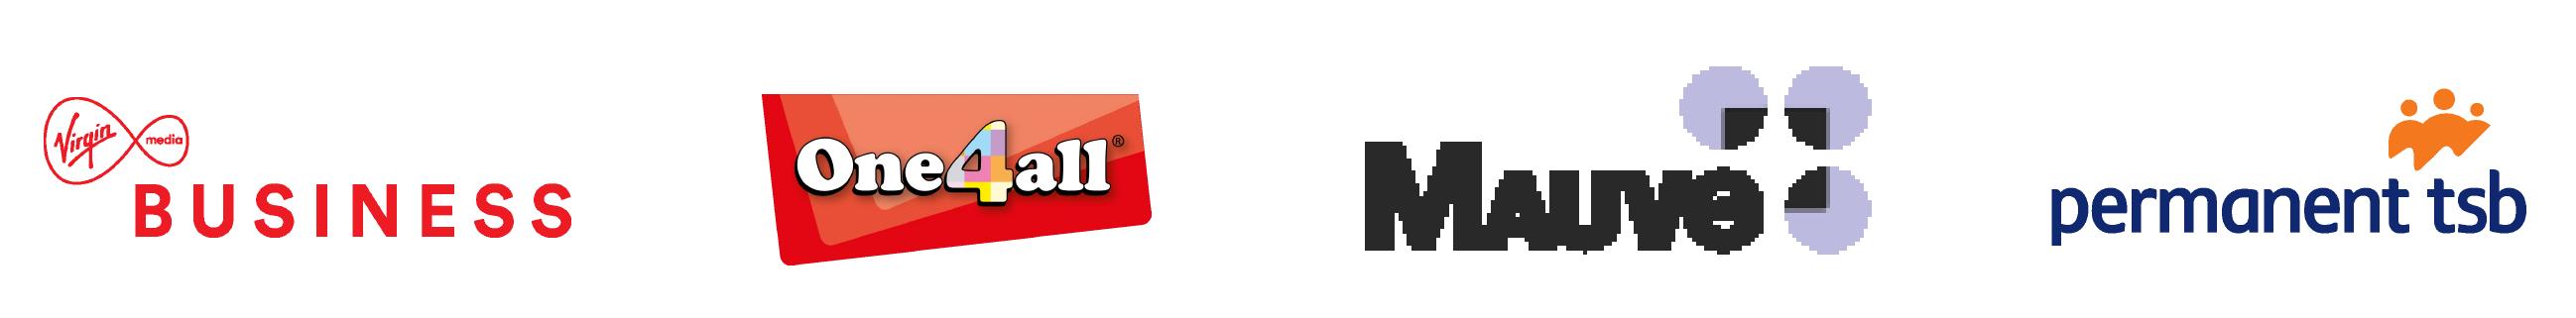 AIS 2021 logo-04-01